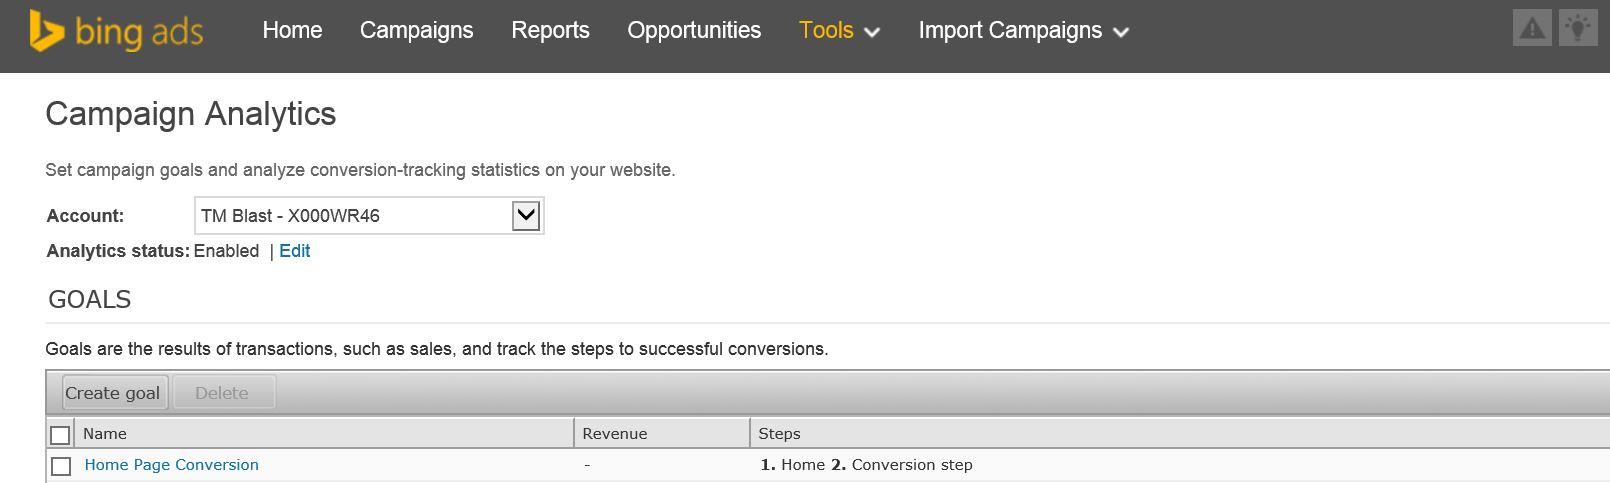 Bing Ads Campaign Analytics